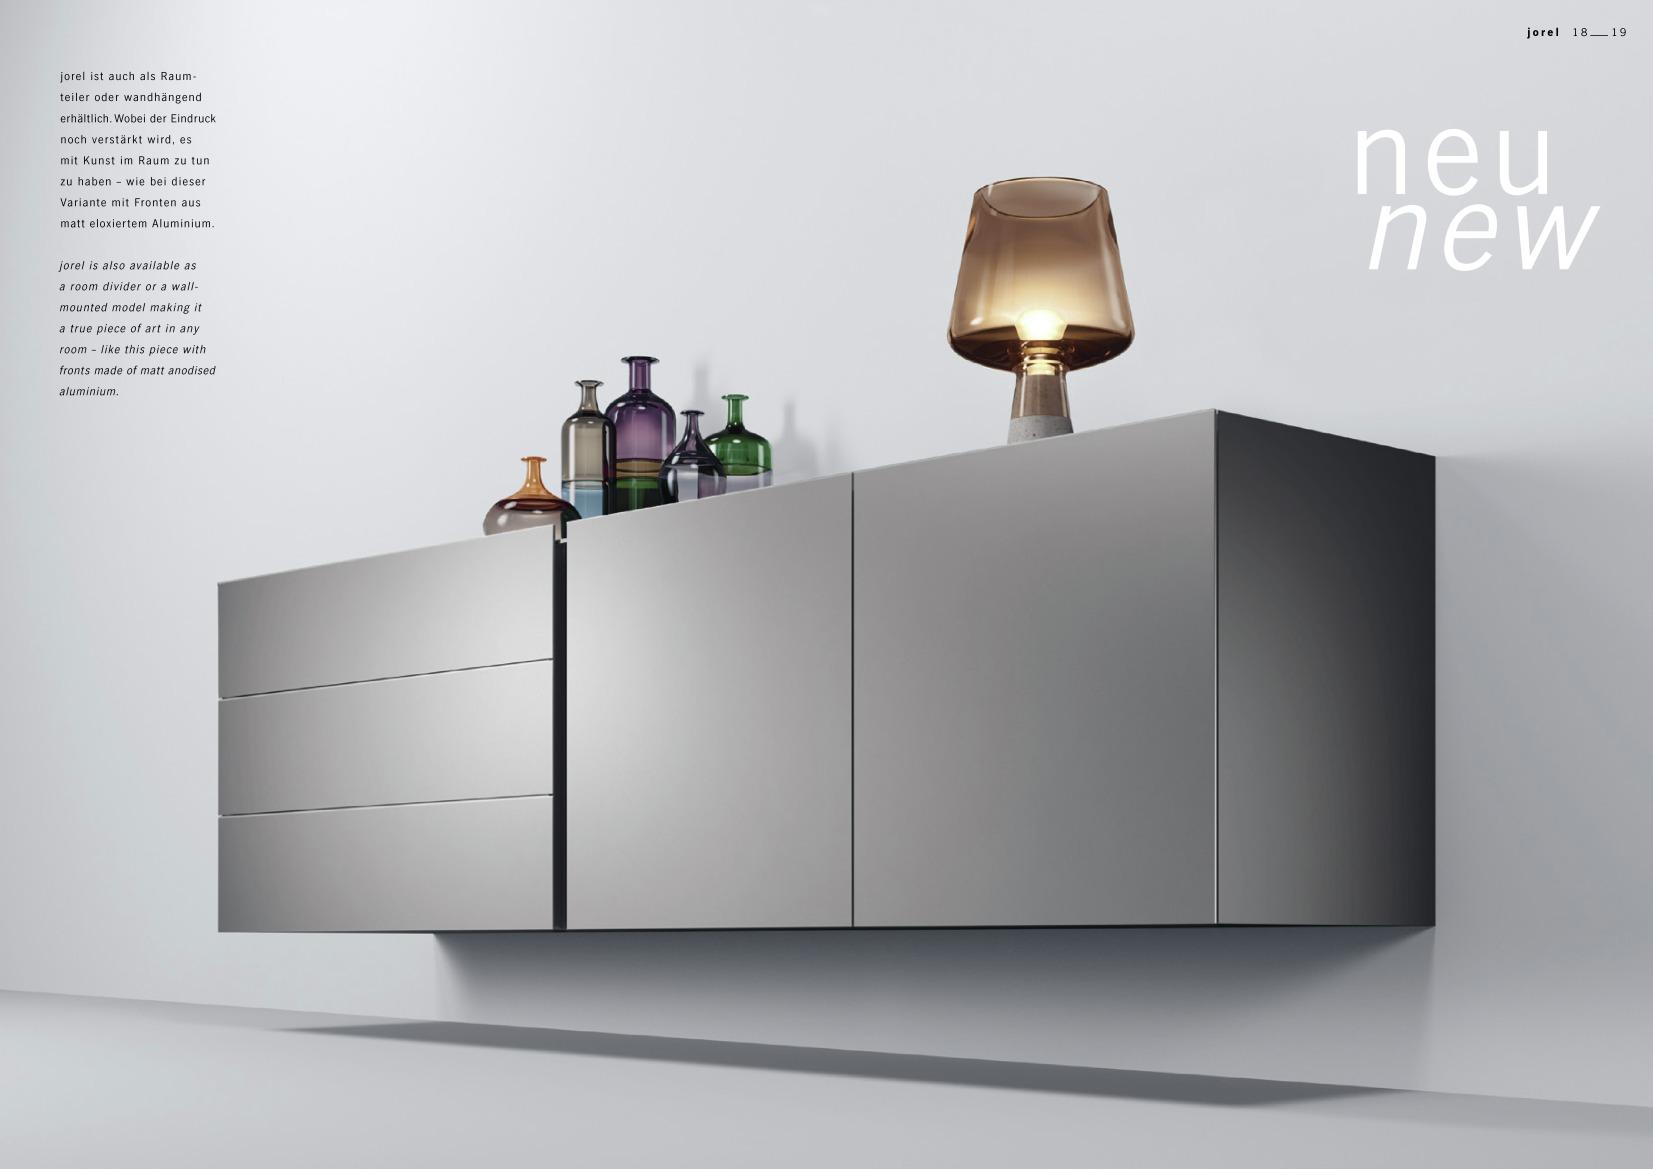 interluebke lookbook 2017 gs 8 m bel weber neustadt landau karlsruhe. Black Bedroom Furniture Sets. Home Design Ideas